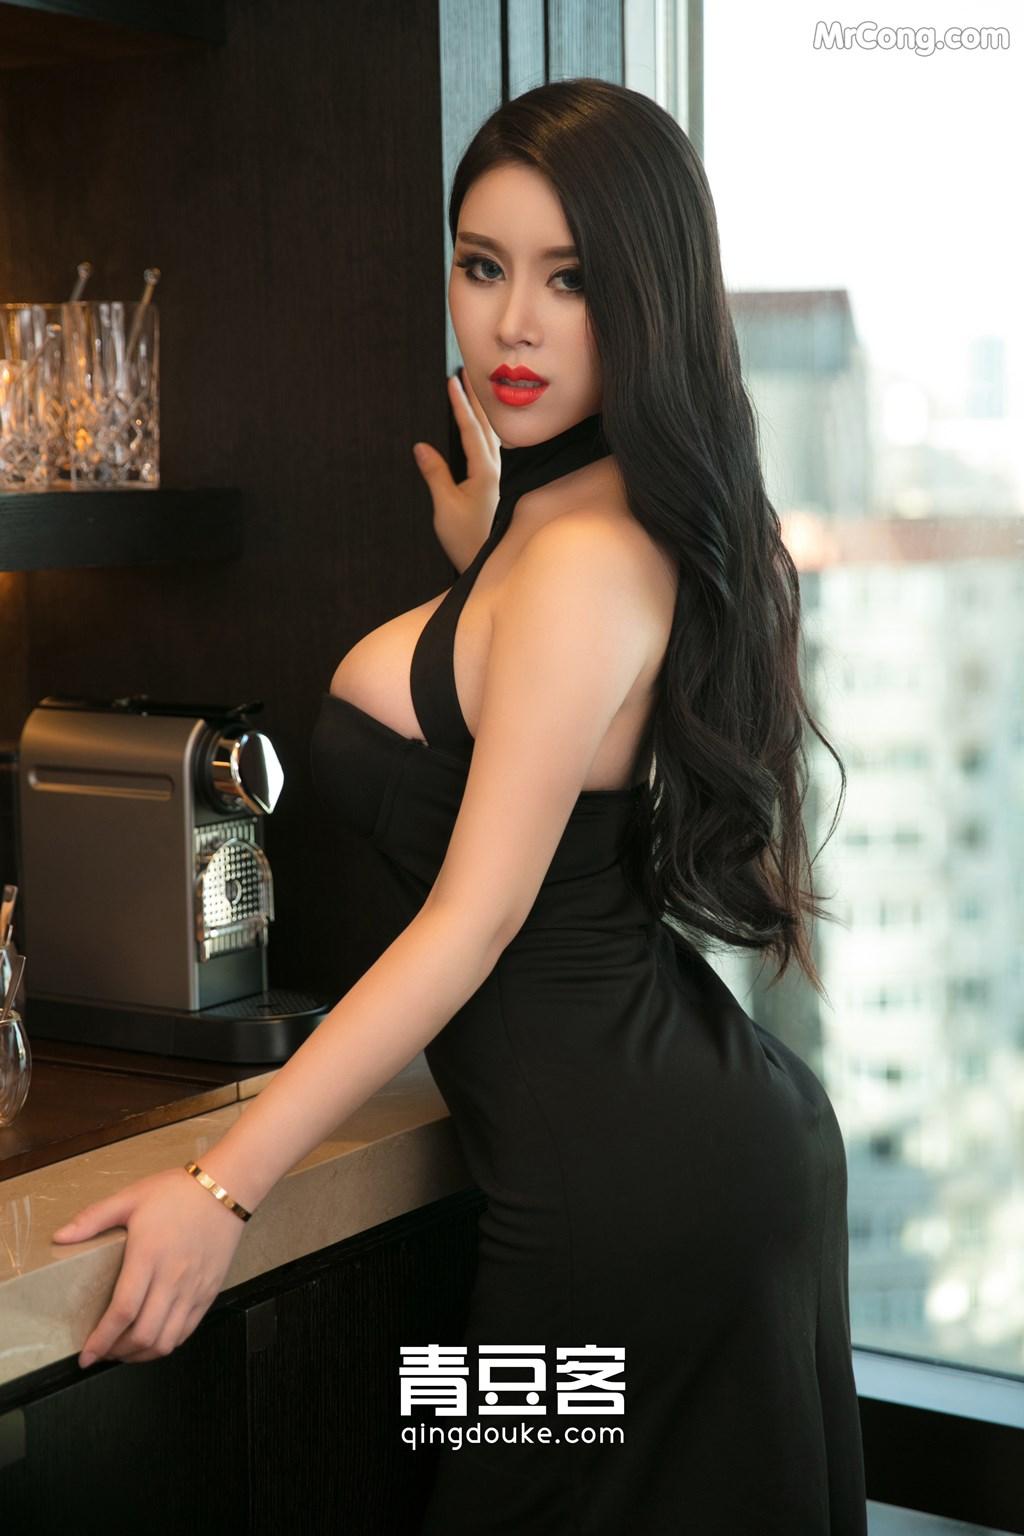 Image QingDouKe-2017-11-05-Ke-Rui-Na-MrCong.com-013 in post QingDouKe 2017-11-05: Người mẫu Ke Rui Na (可蕊娜) (48 ảnh)